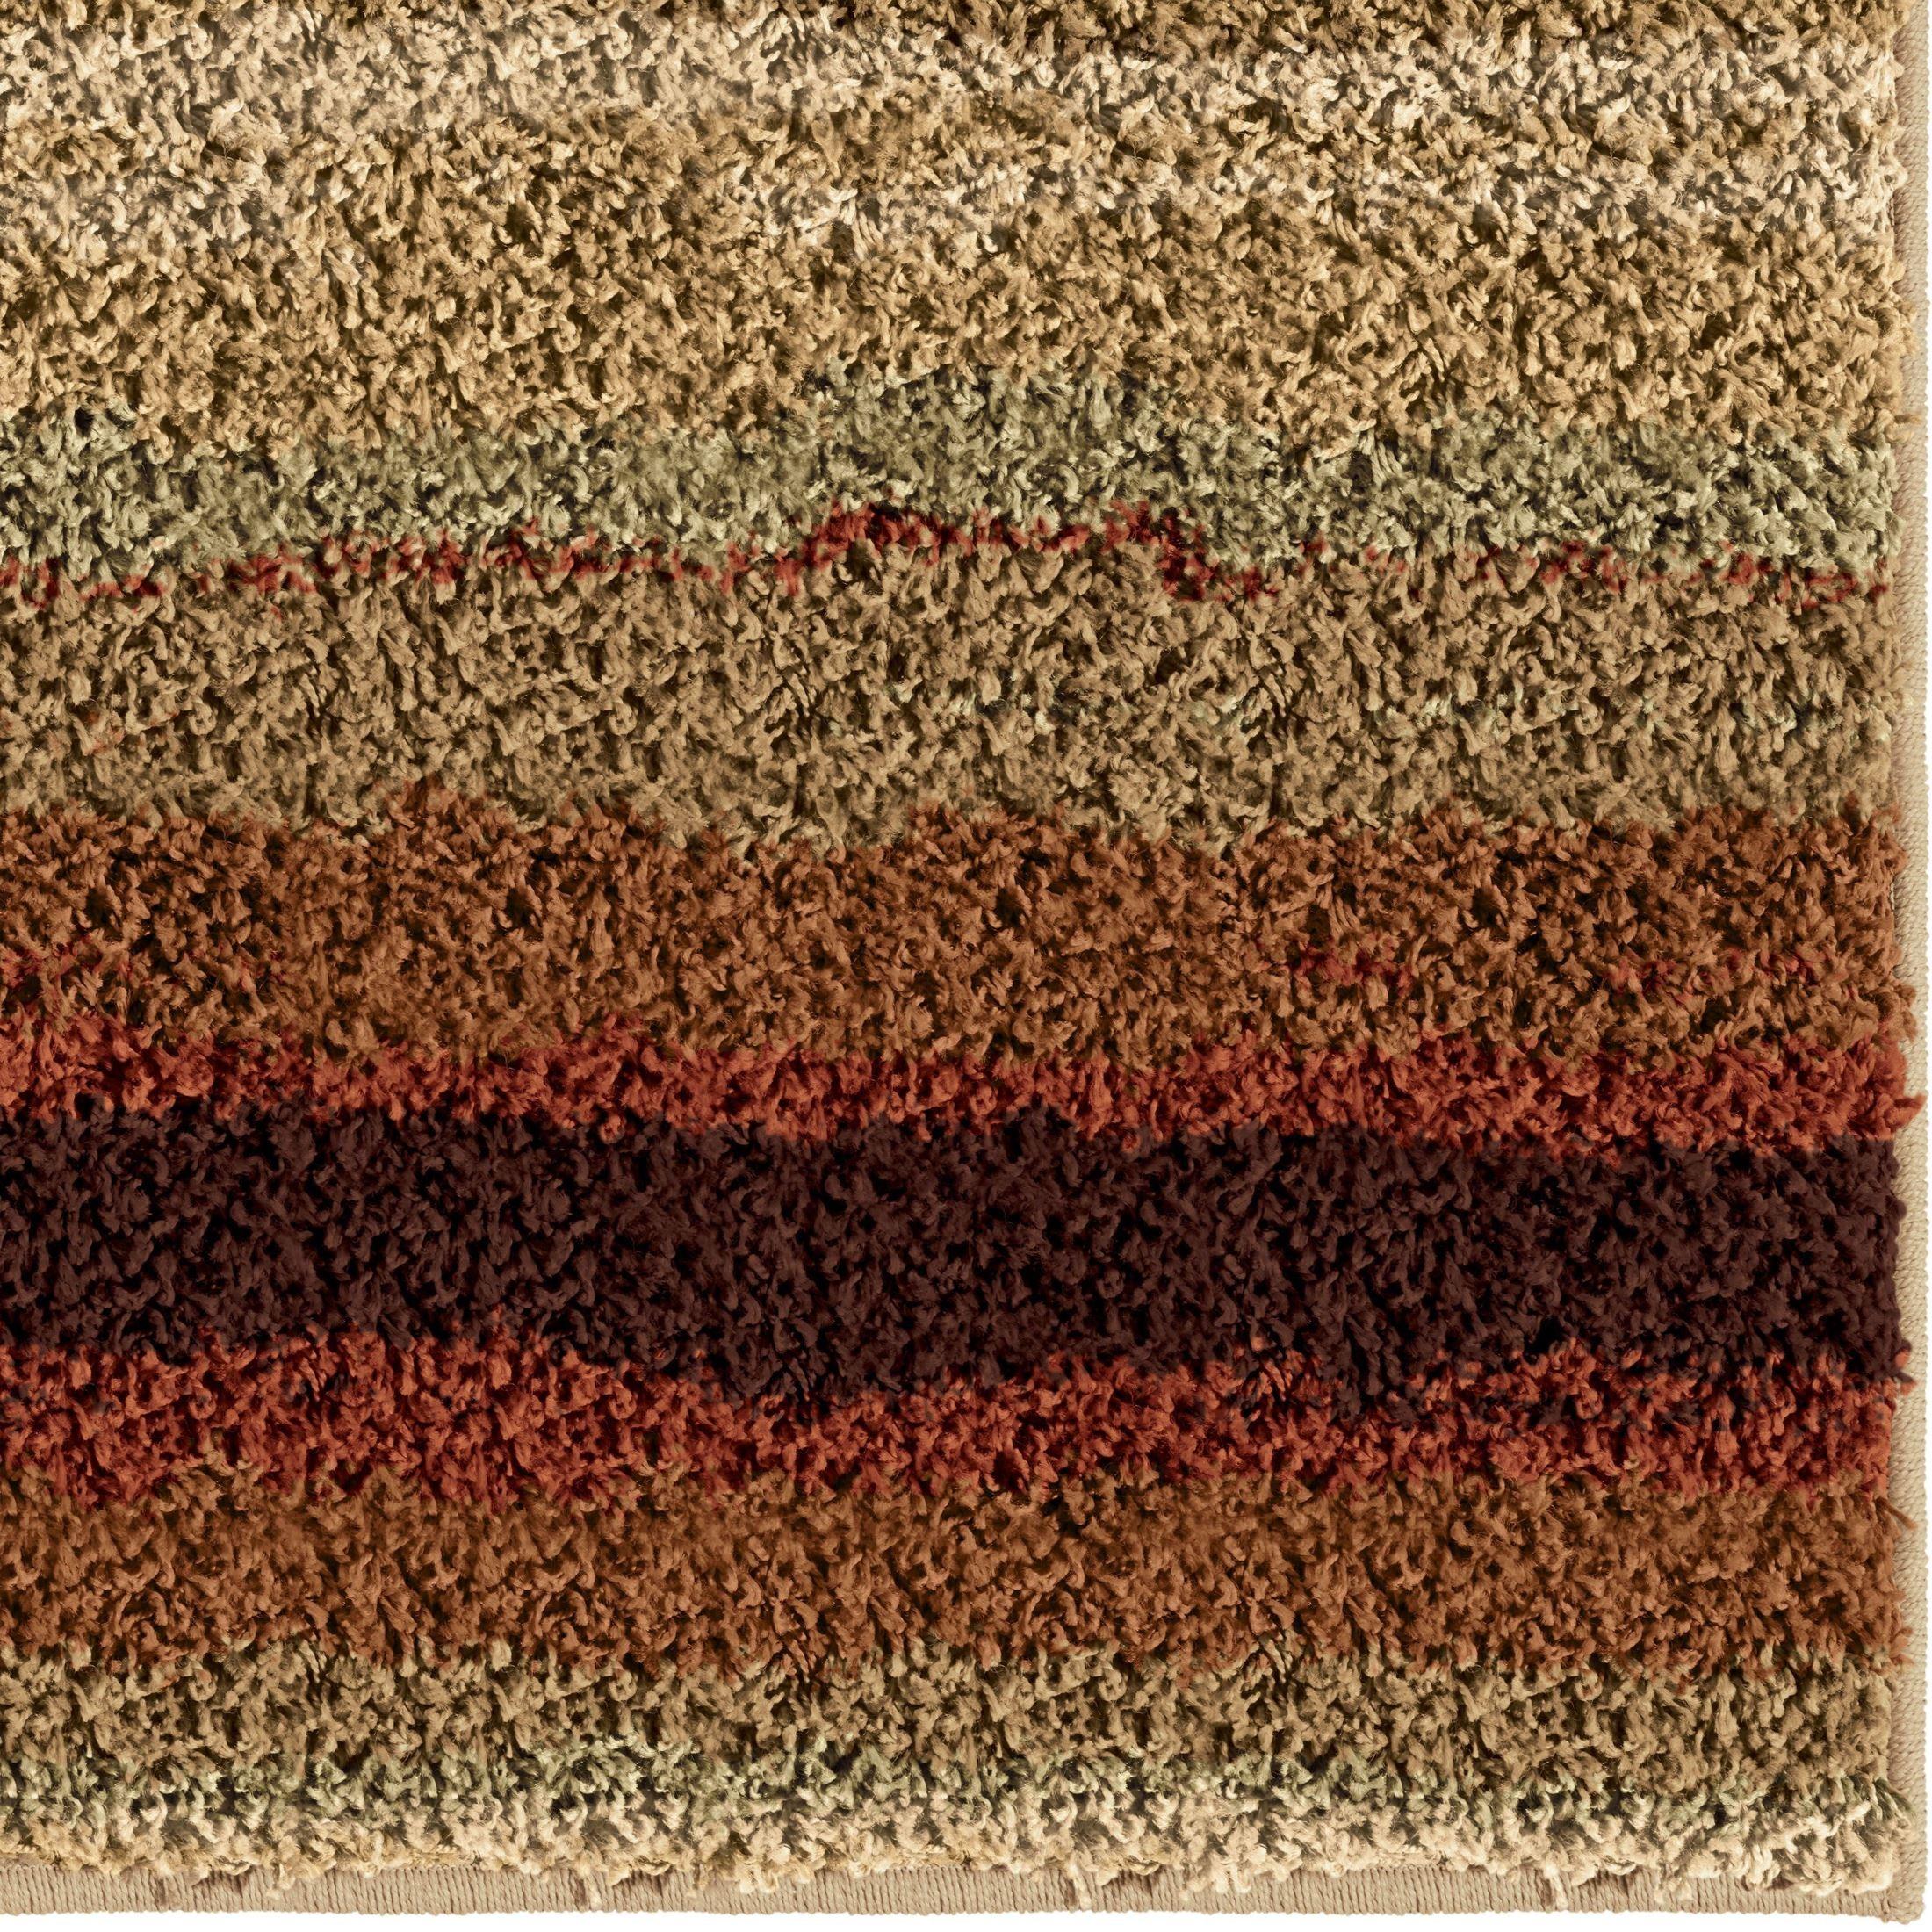 Sundown Red Medium Rug From Orian 3709 5x8 Coleman